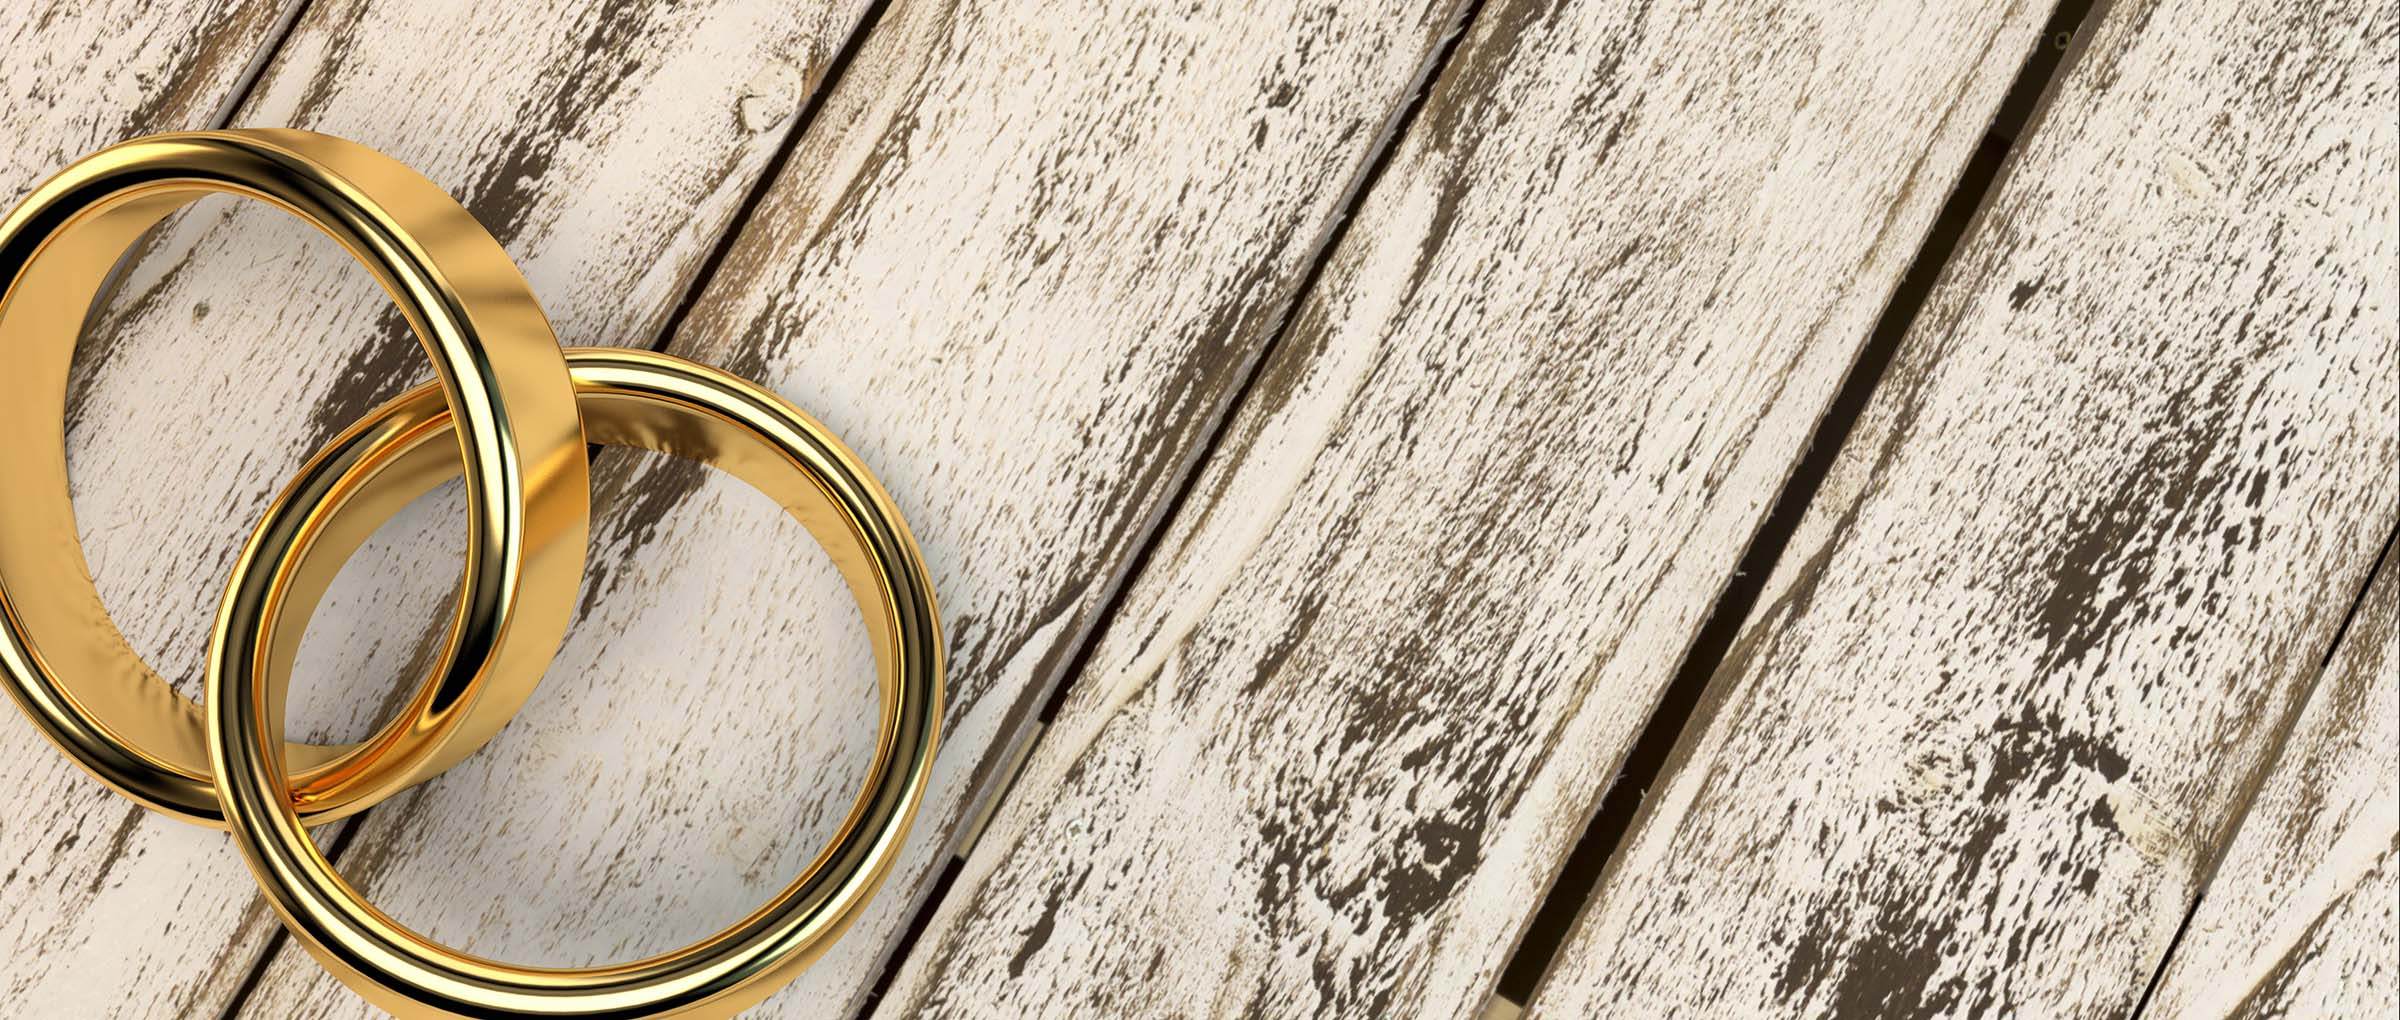 Matrimonio para gestación subrogada